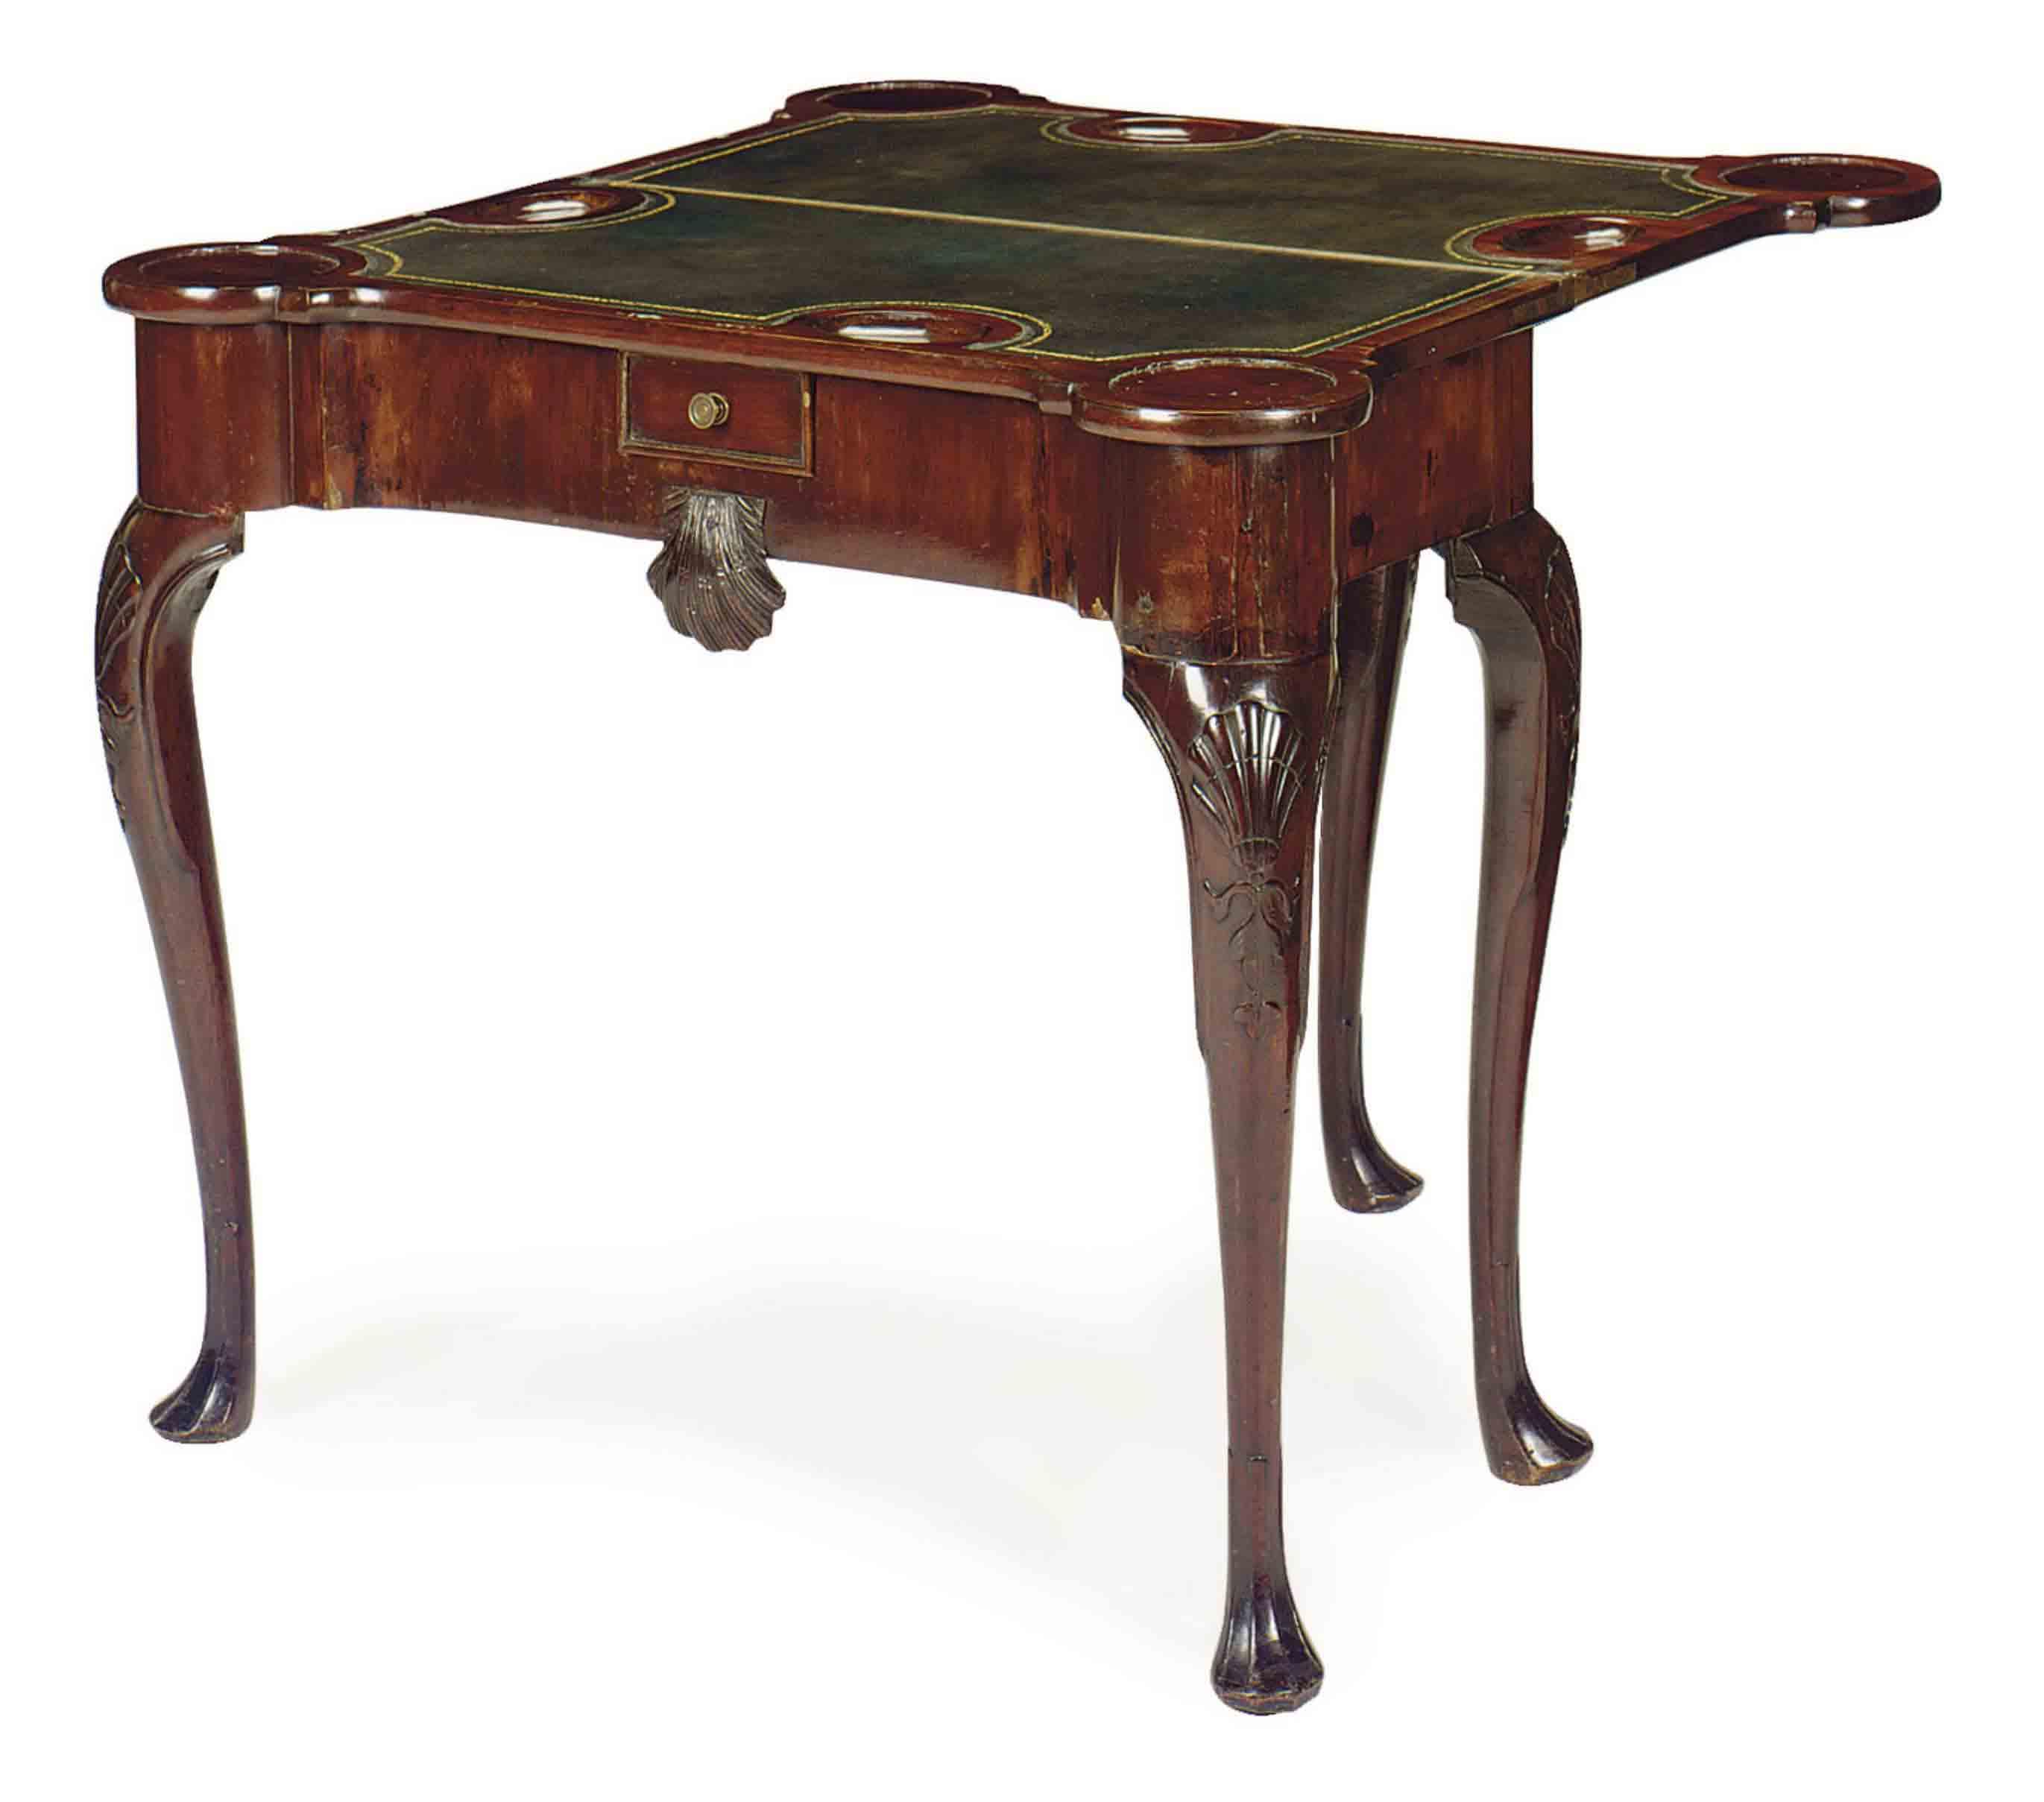 A GEORGE III MAHOGANY FOLD TOP GAMES TABLE,